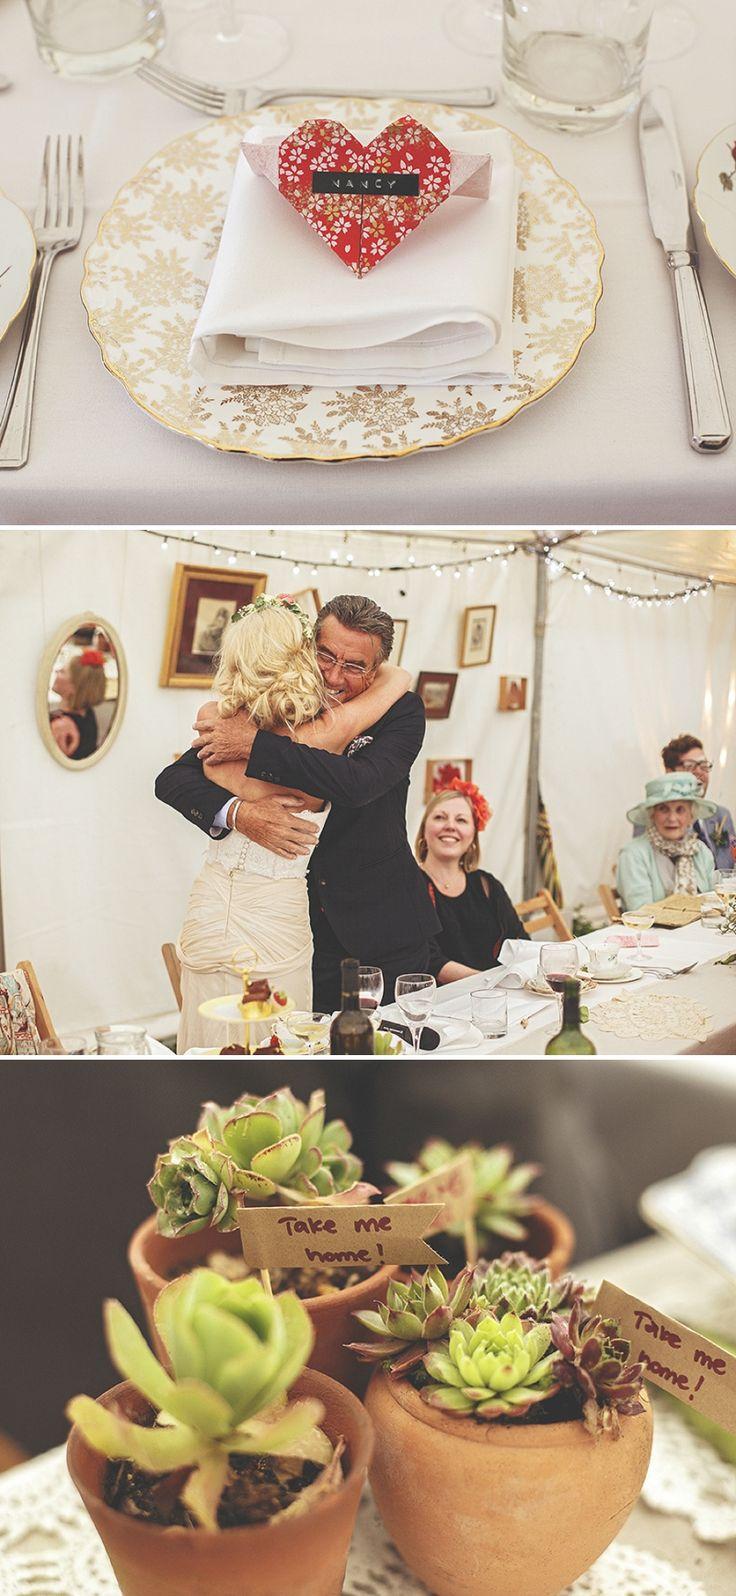 best greece wedding images on pinterest weddings floral